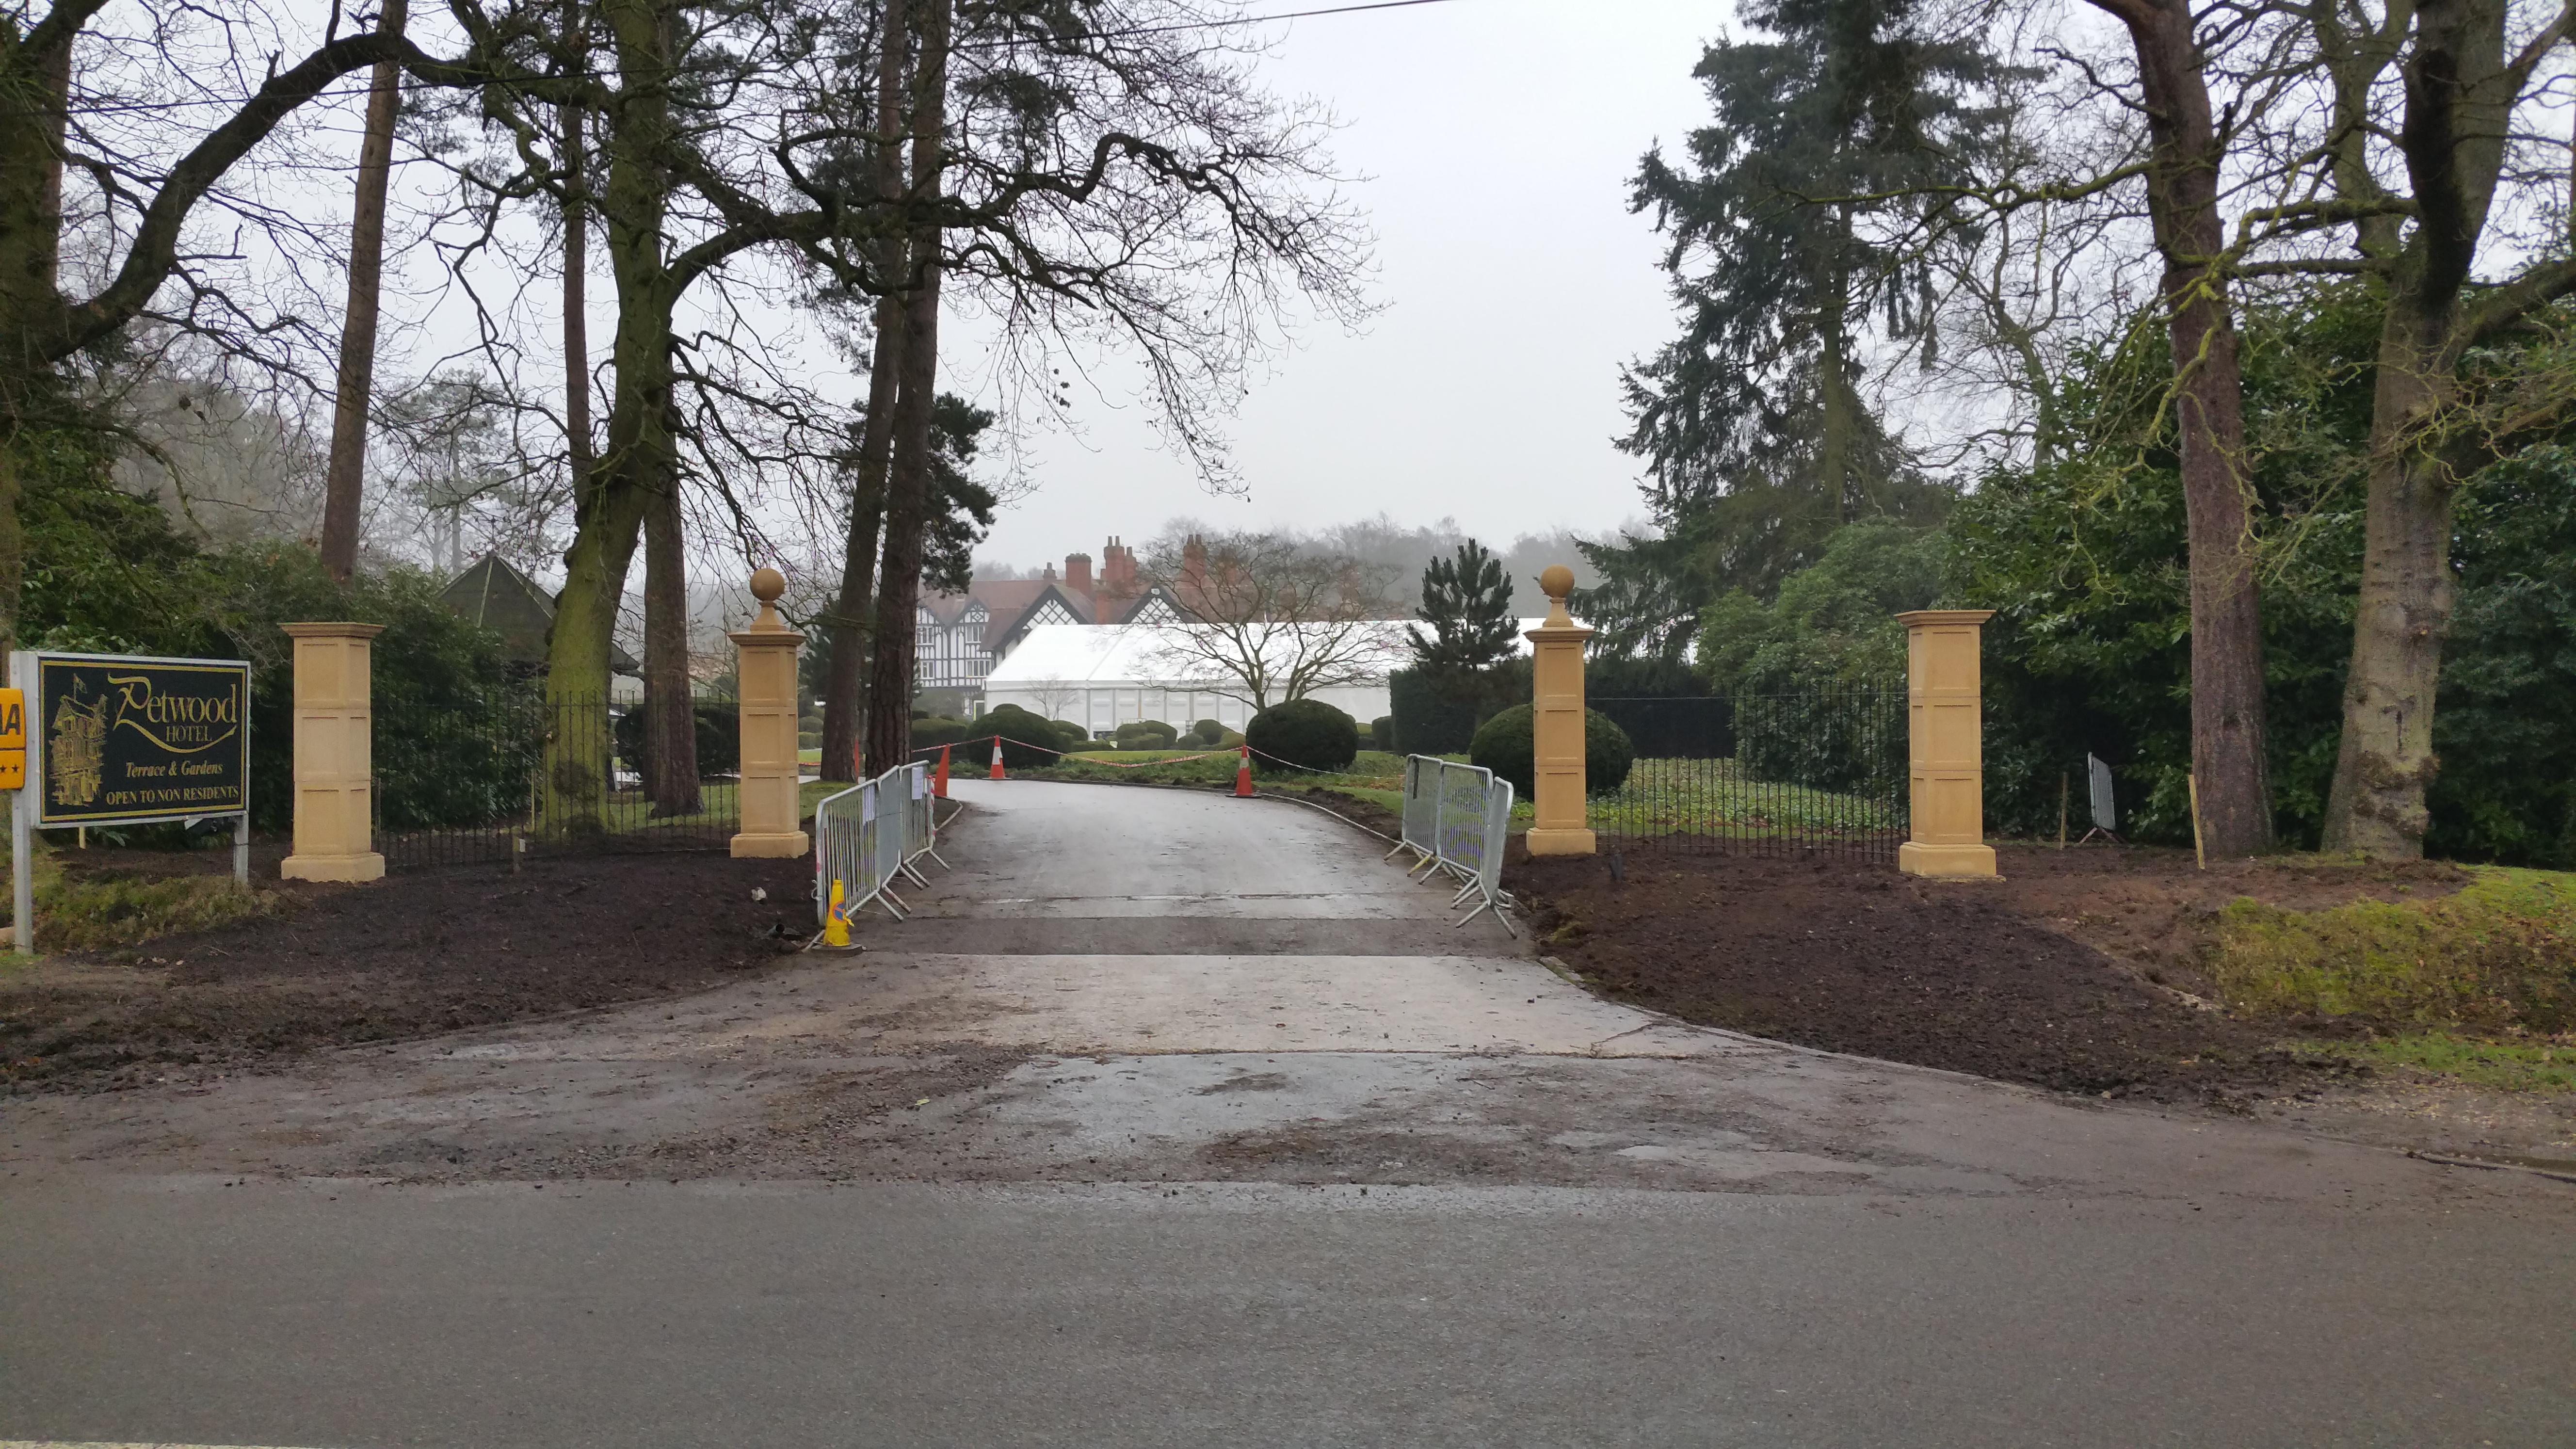 Petwood Hotel Entrance